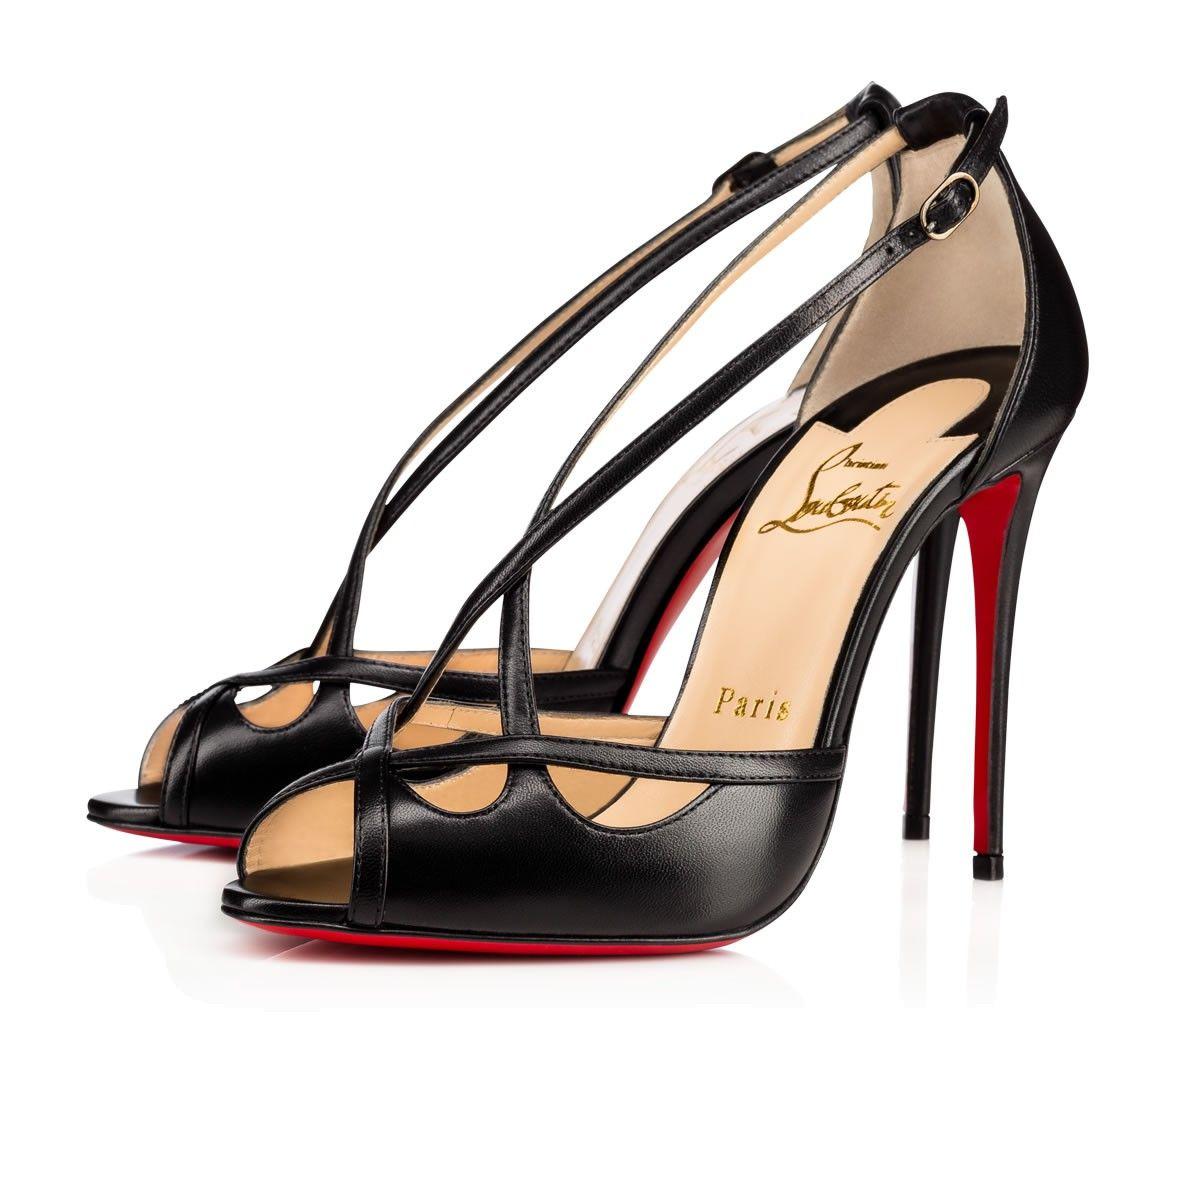 CHRISTIAN LOUBOUTIN Madalena Nappa Laminata 100 Black Lambskin - Women Shoes  - Christian Louboutin.  christianlouboutin  shoes   111aefc0b5